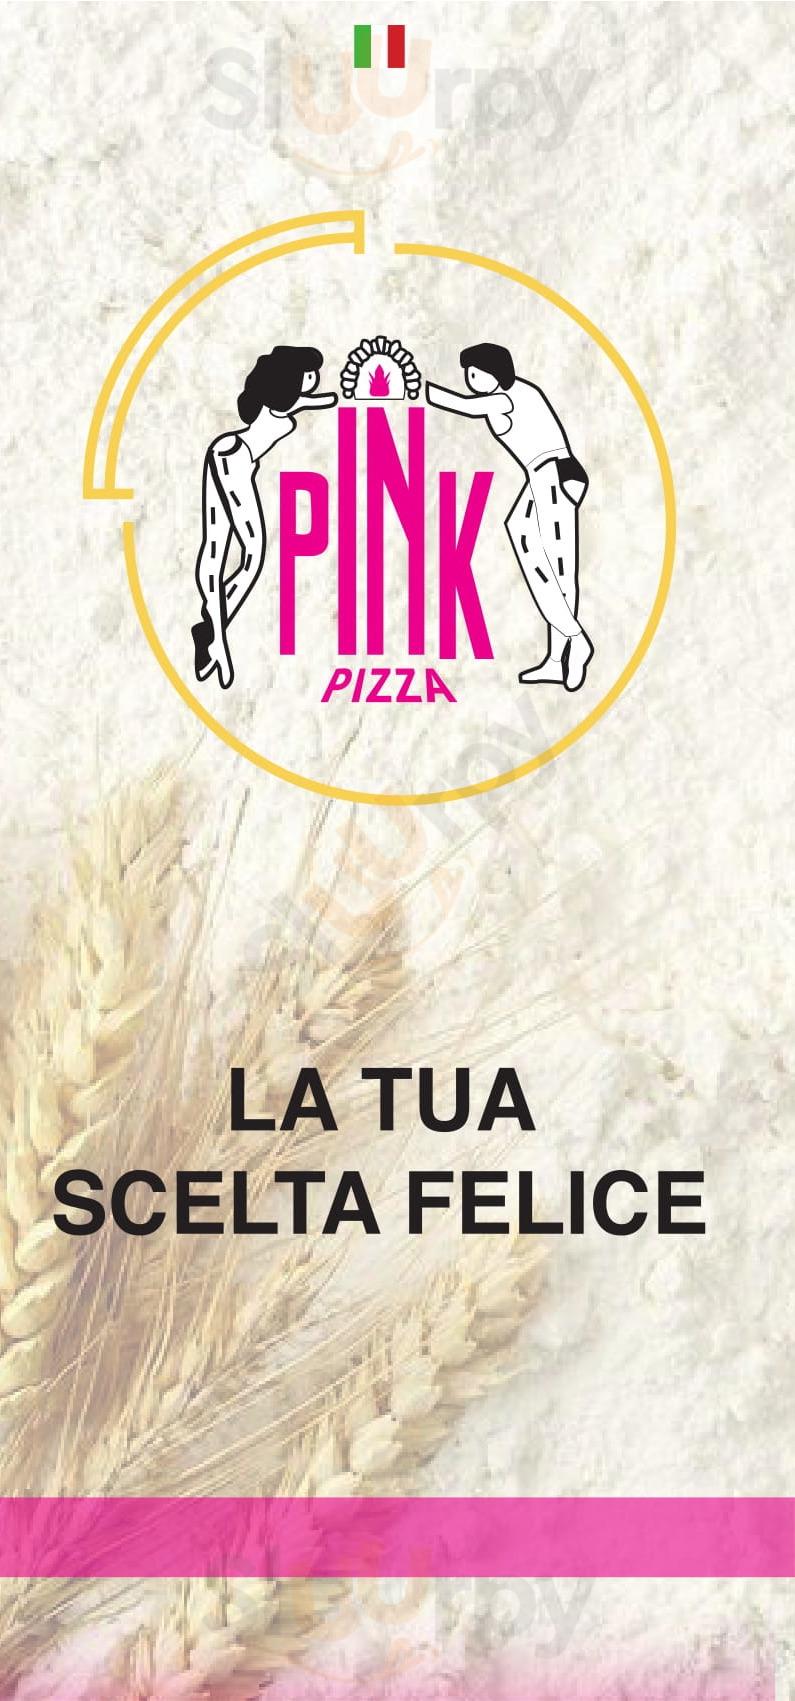 PINK PIZZA Ragusa menù 1 pagina